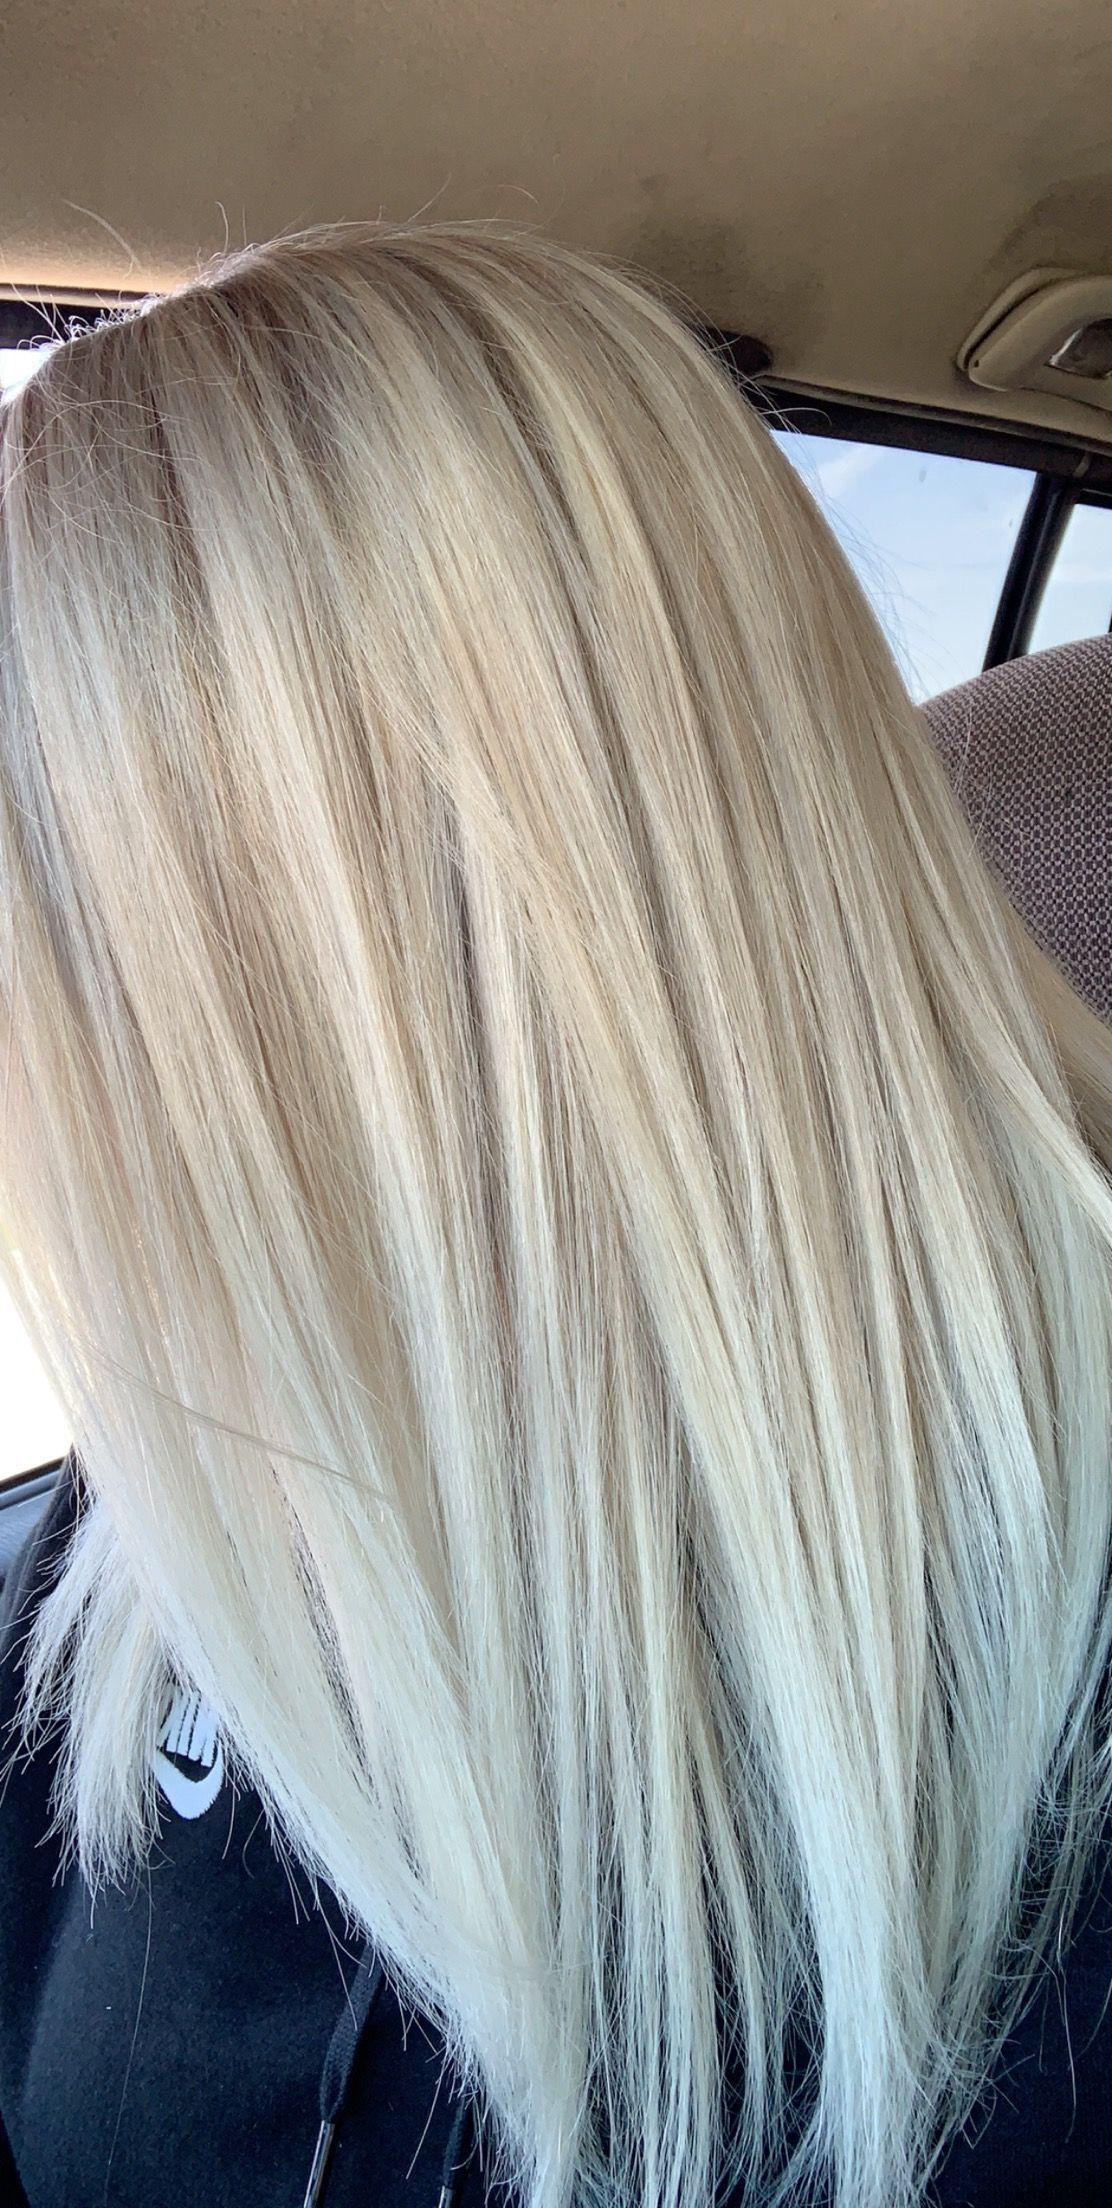 White Icy Blonde Platinumblondehighlights White Icy Blonde Platinum Blonde Hair In 2020 Ash Blonde Hair With Highlights Blonde Hair With Highlights Blonde Hair Shades